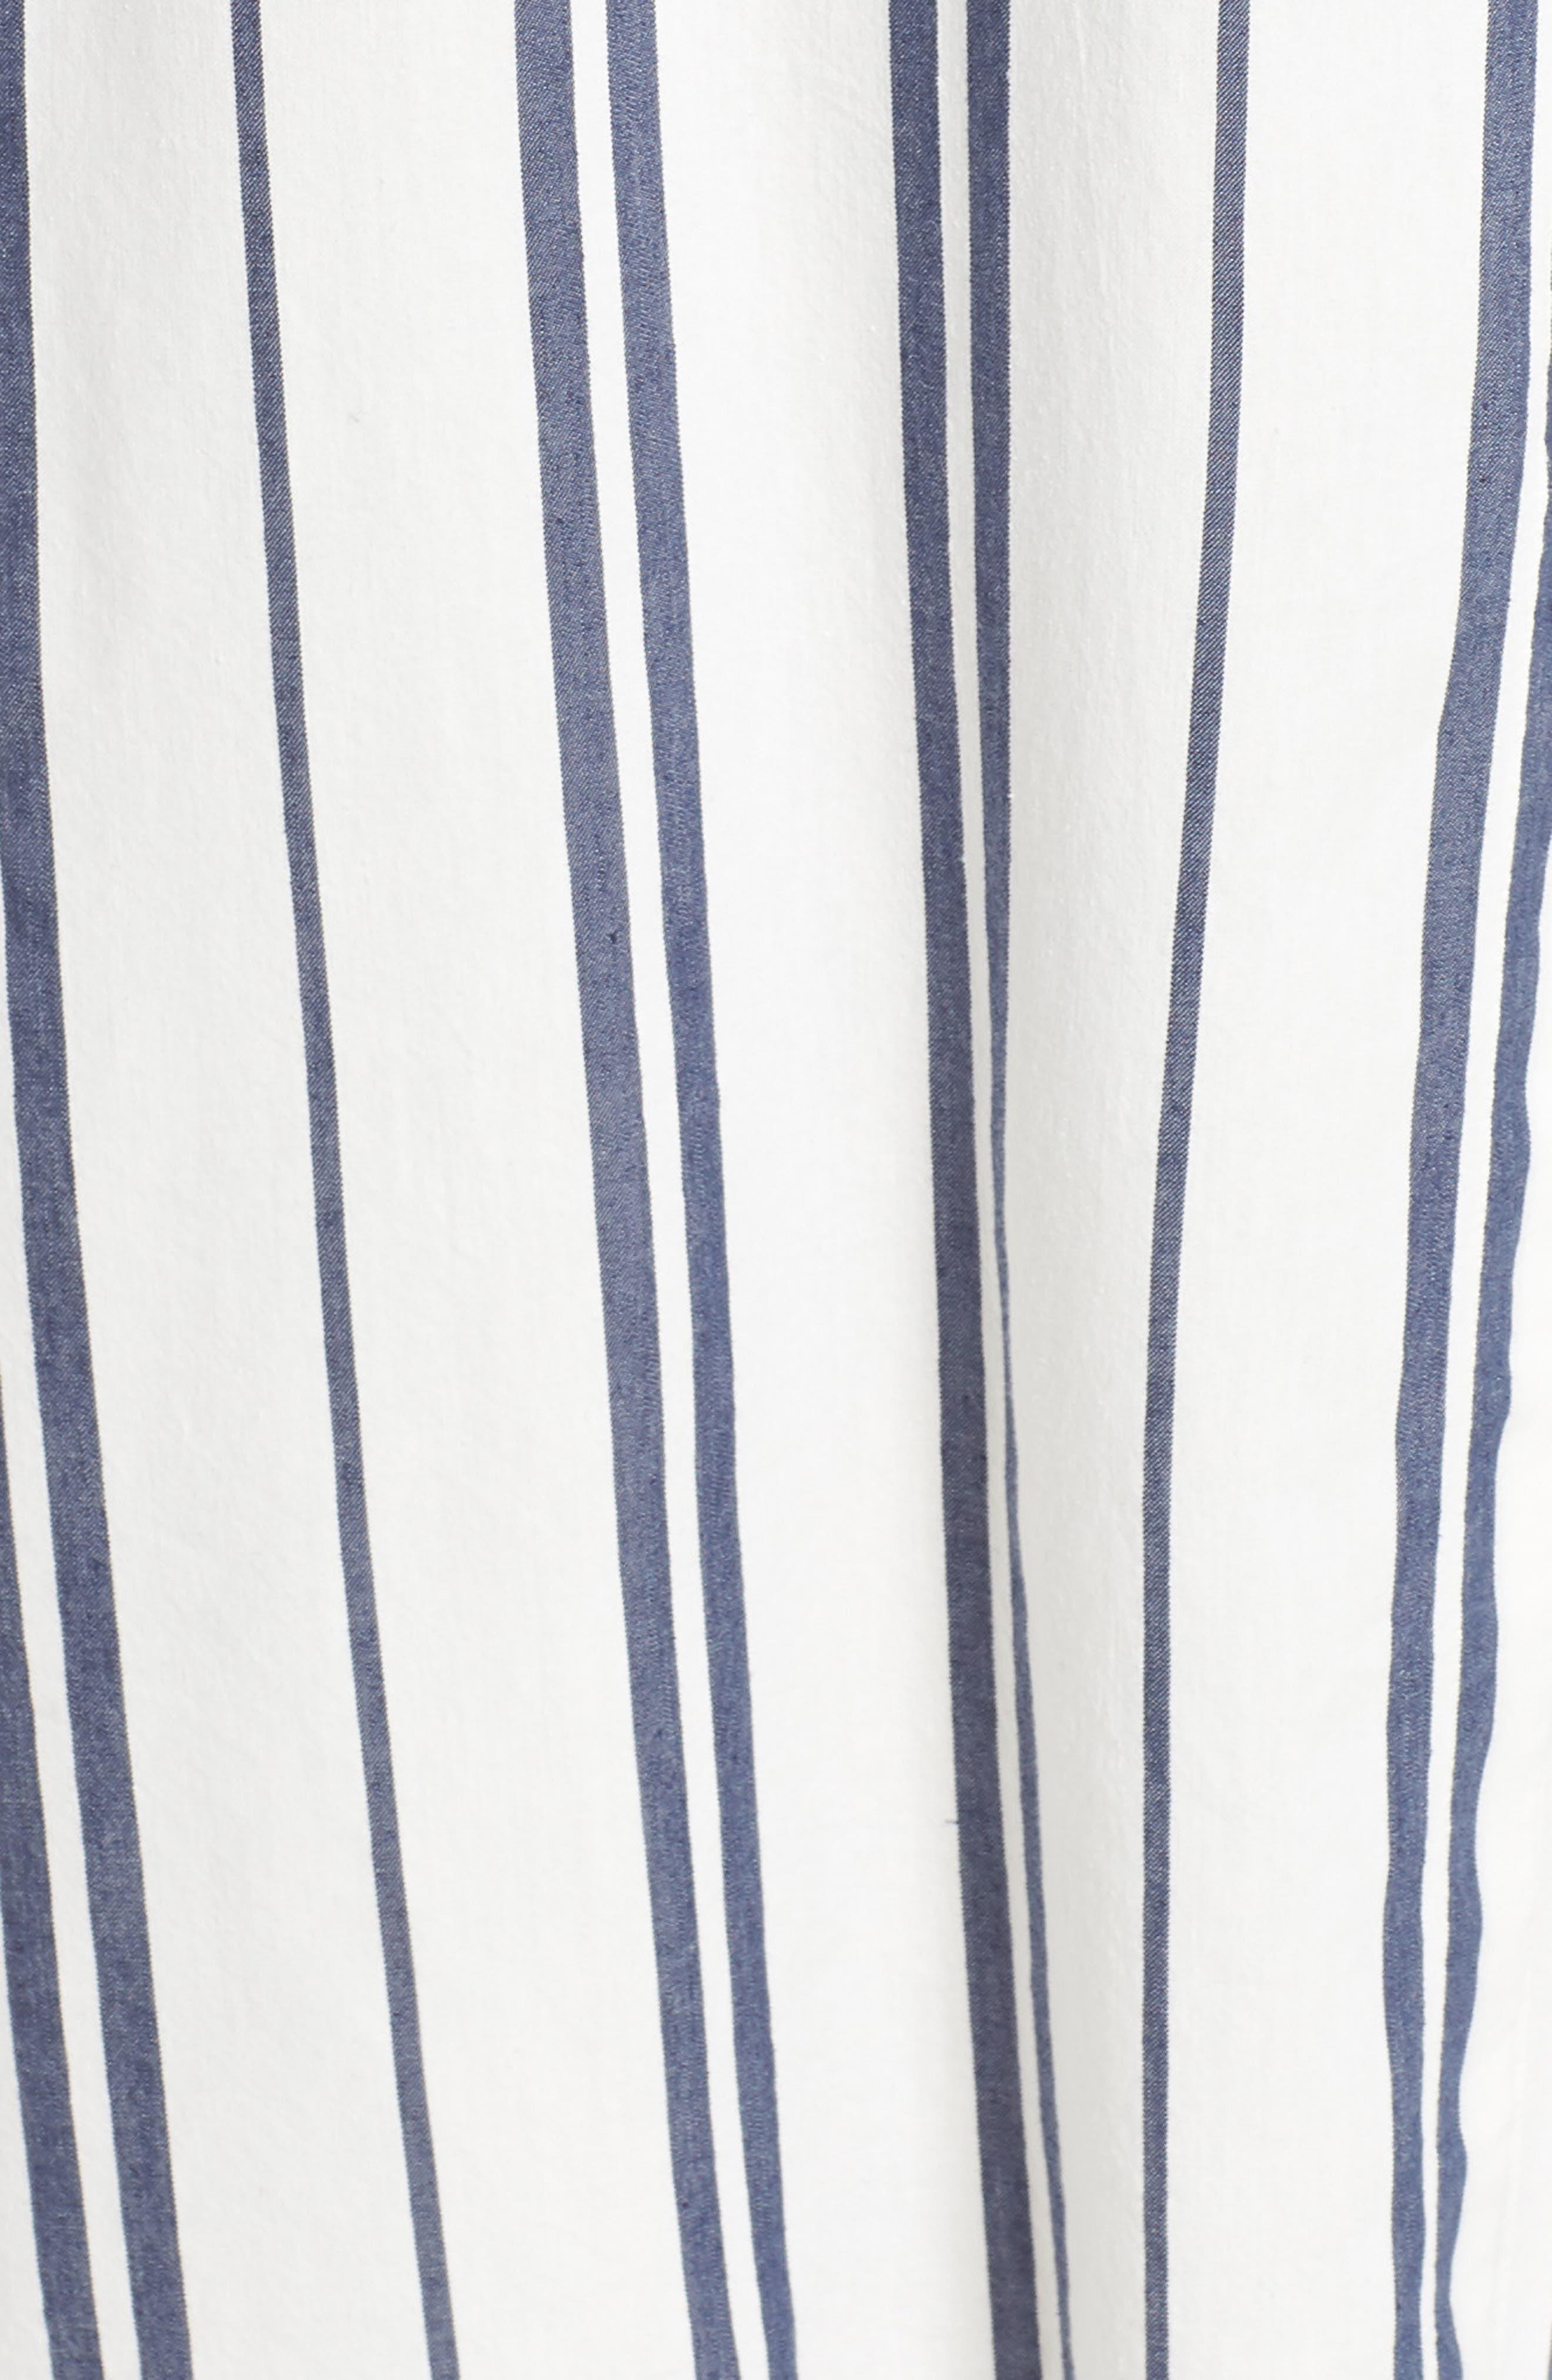 VINCE CAMUTO, Valiant Stripe Midi Shirtdress, Alternate thumbnail 6, color, PEARL IVORY